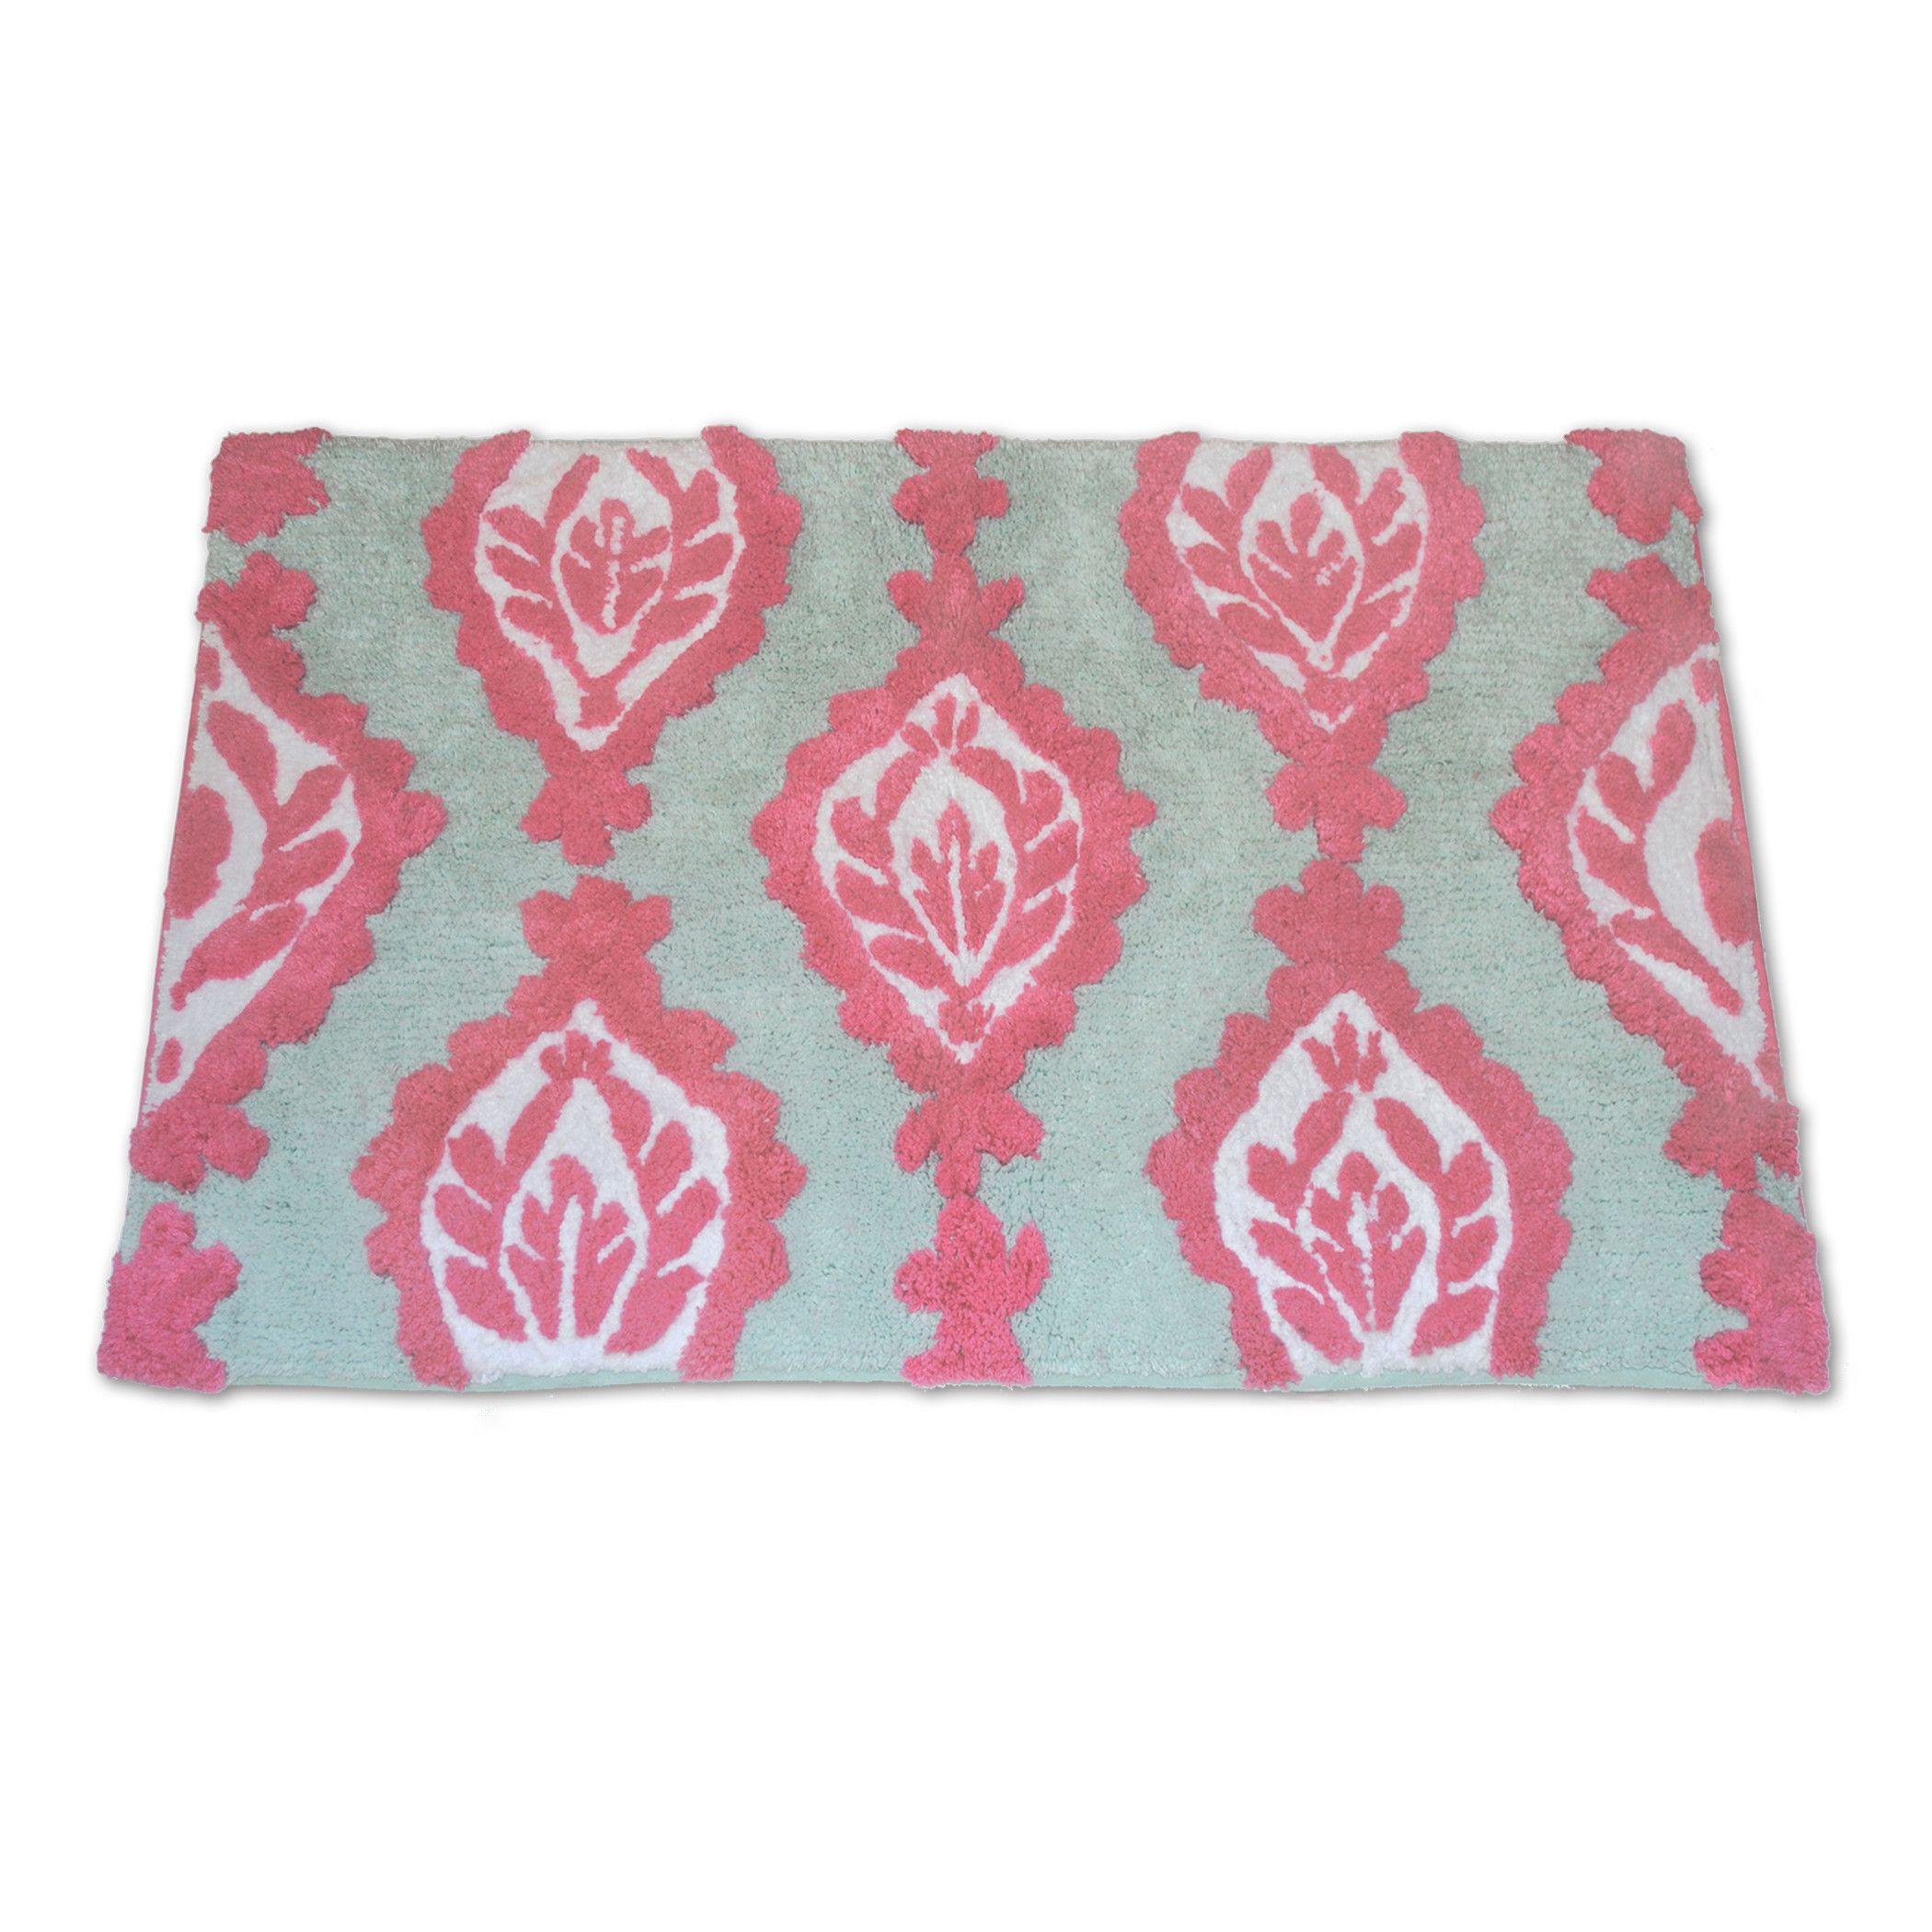 towel luxury of set bathroom grey peacock christmas bath rug towels